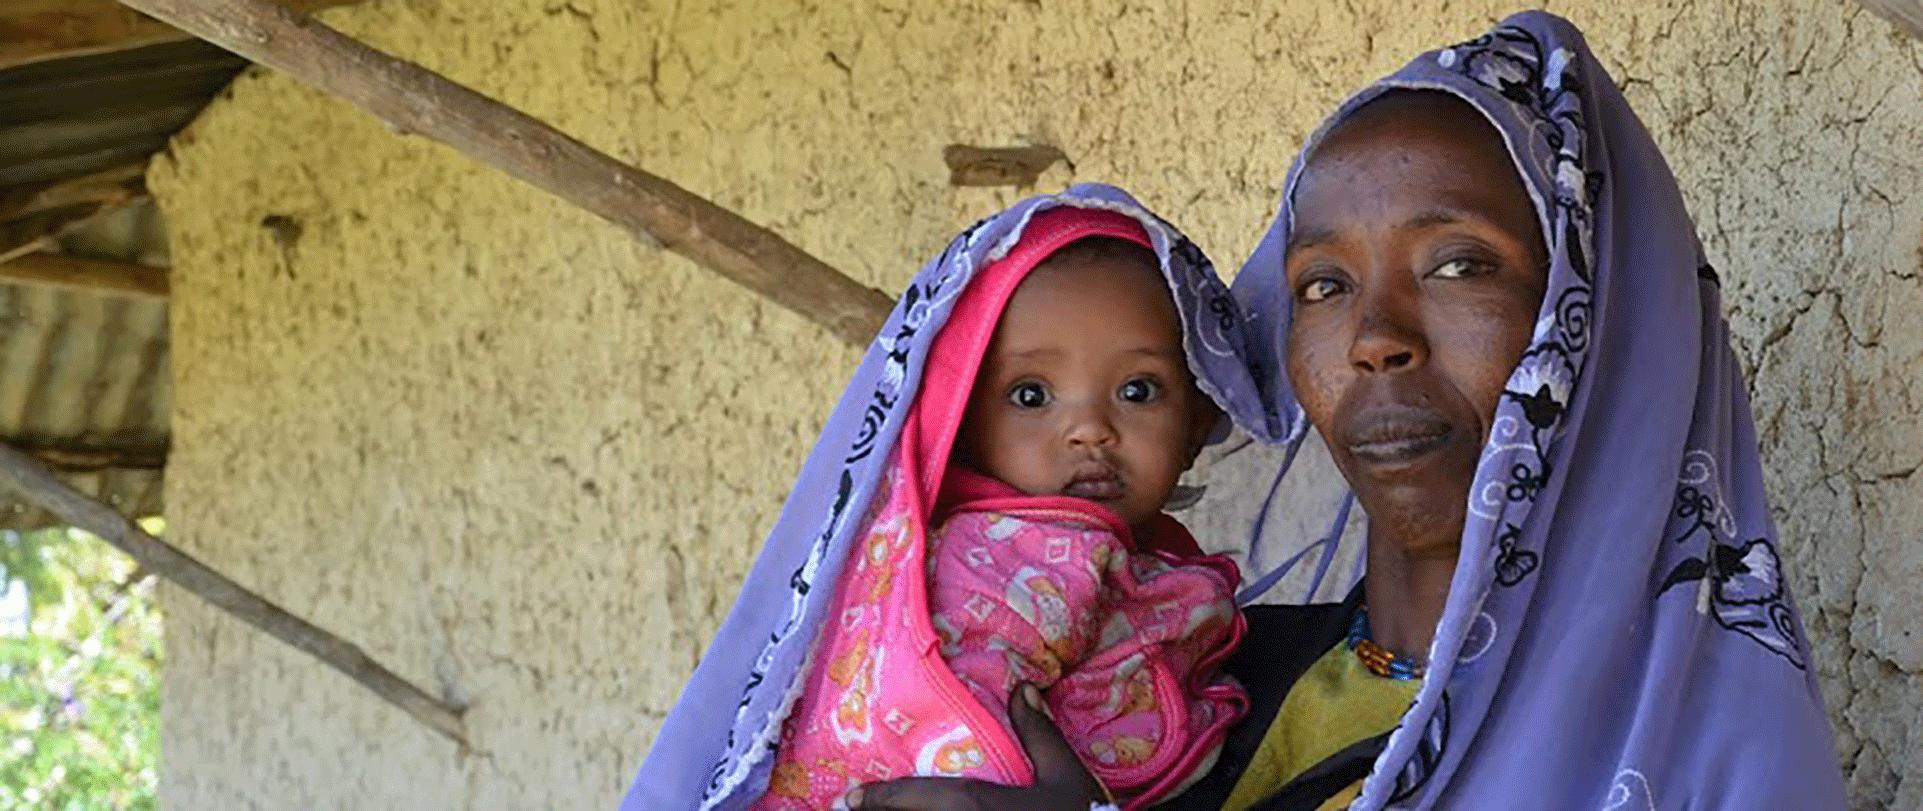 homepage-slider-el-nino-crisis-appeal-1920-razaiya-and-baby-2-ethiopia